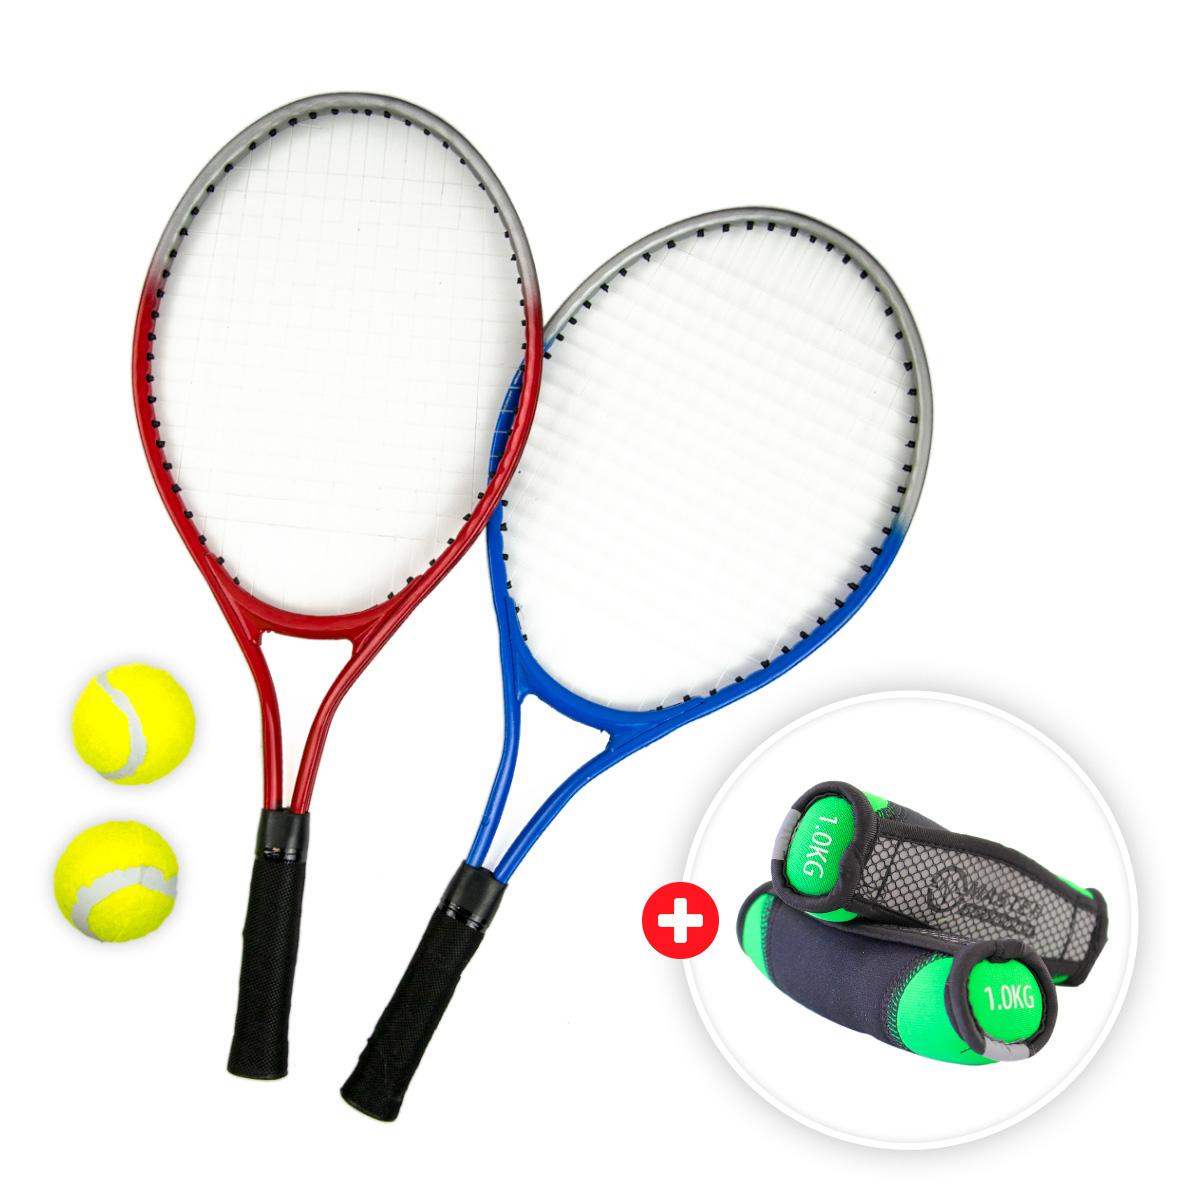 Akční set - tenisový set MASTER - 2 ks raketa síť a míčky + neoprenové činky MASTER Jogging 2 x 1 kg